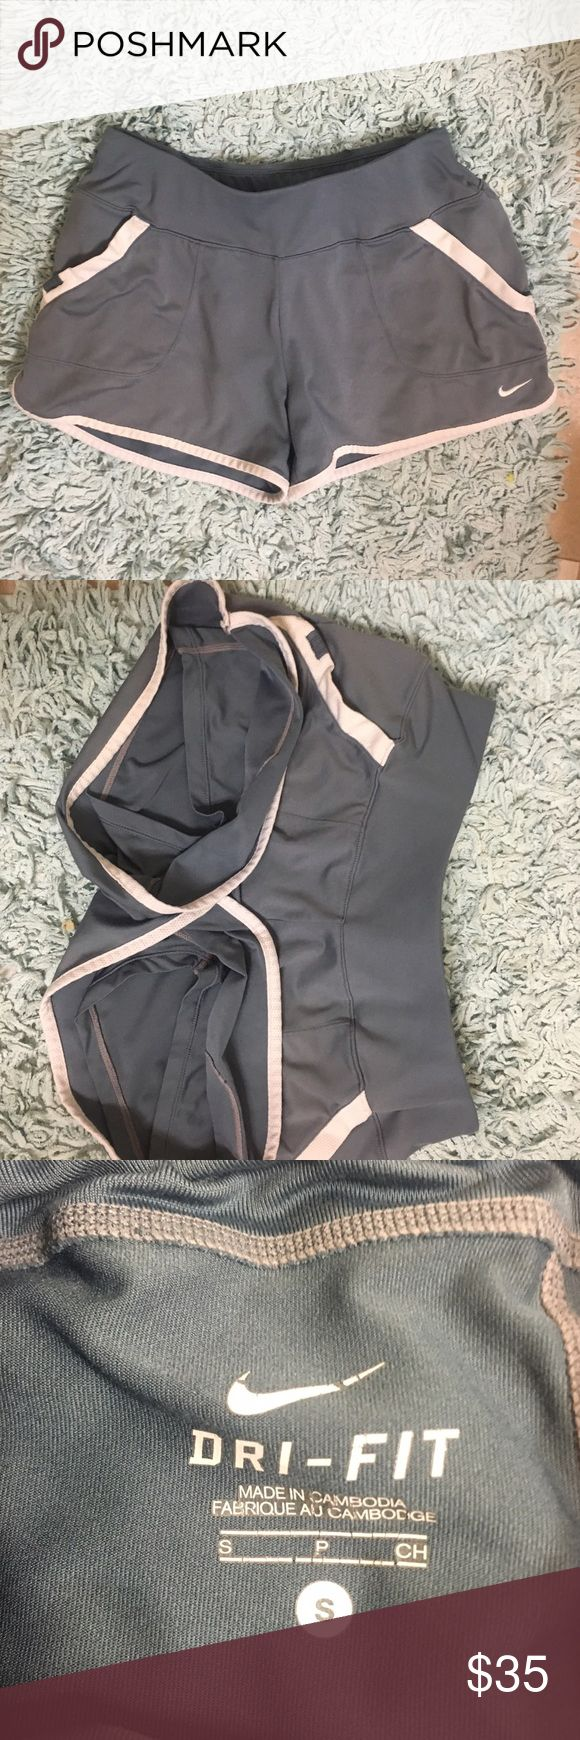 Nike Dri Fit Shorts Size Small NWOT Nike Women's Dri Fit Shorts Size Small NWOT. 💐Bundle and get 20% off your order! Nike Shorts